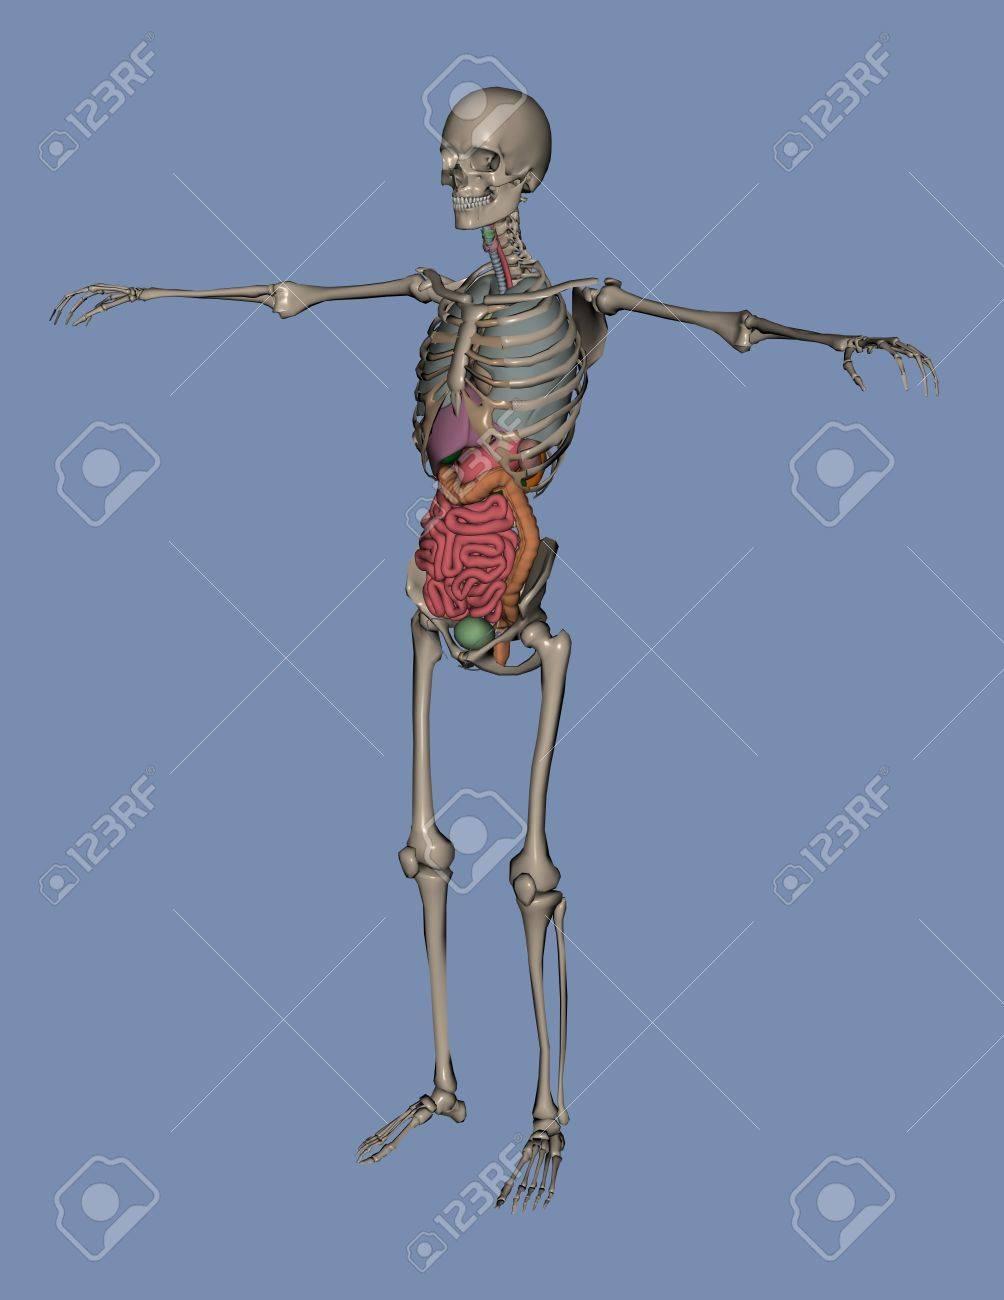 3d De Un Esqueleto Humano Con Los órganos, Intestino Grueso E ...